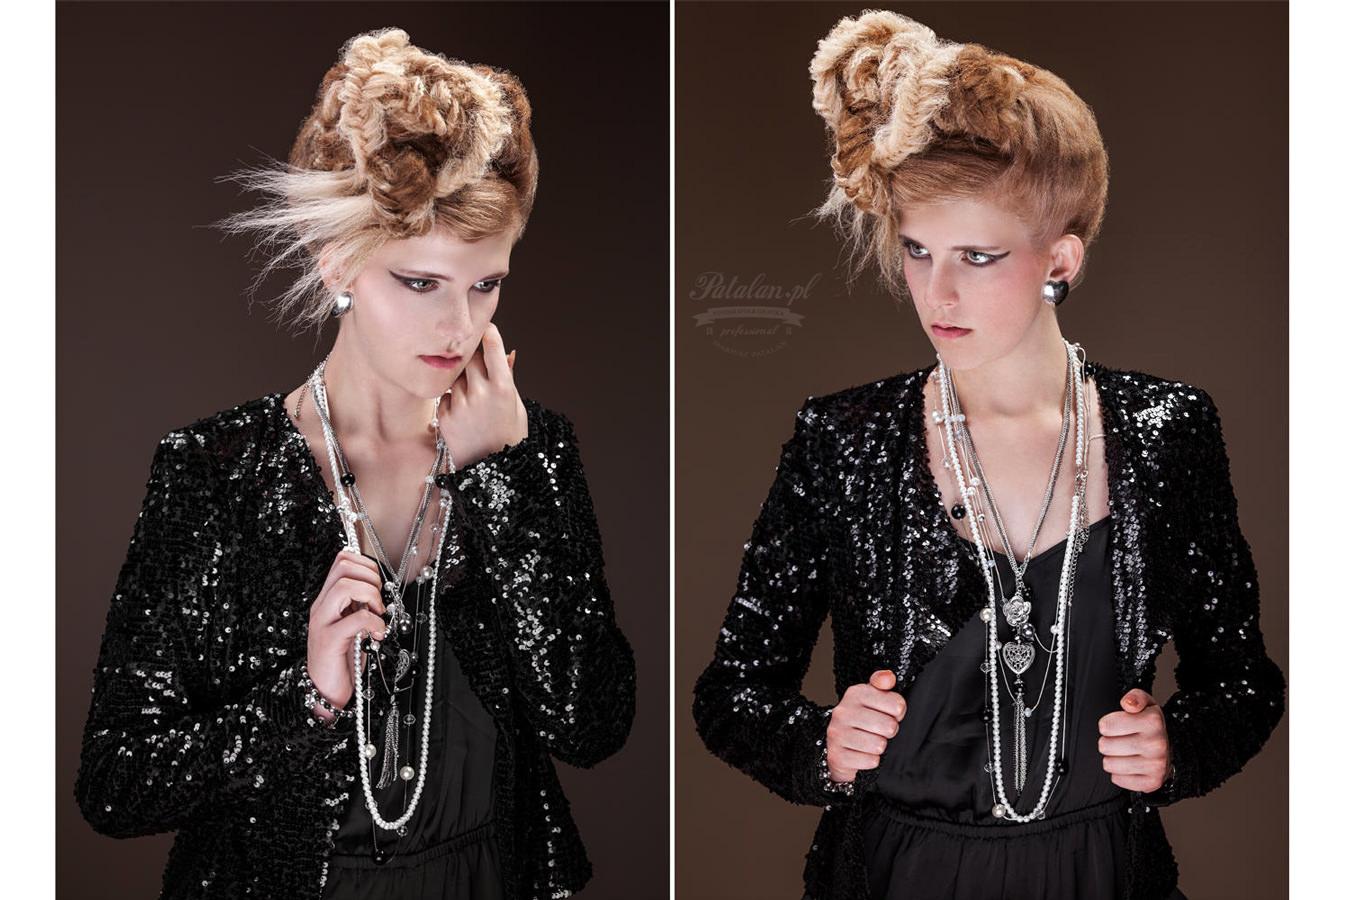 golden pixel studio, zdjęcia fryzur, sesja z modelką, retusz skóry, piękna modelka,